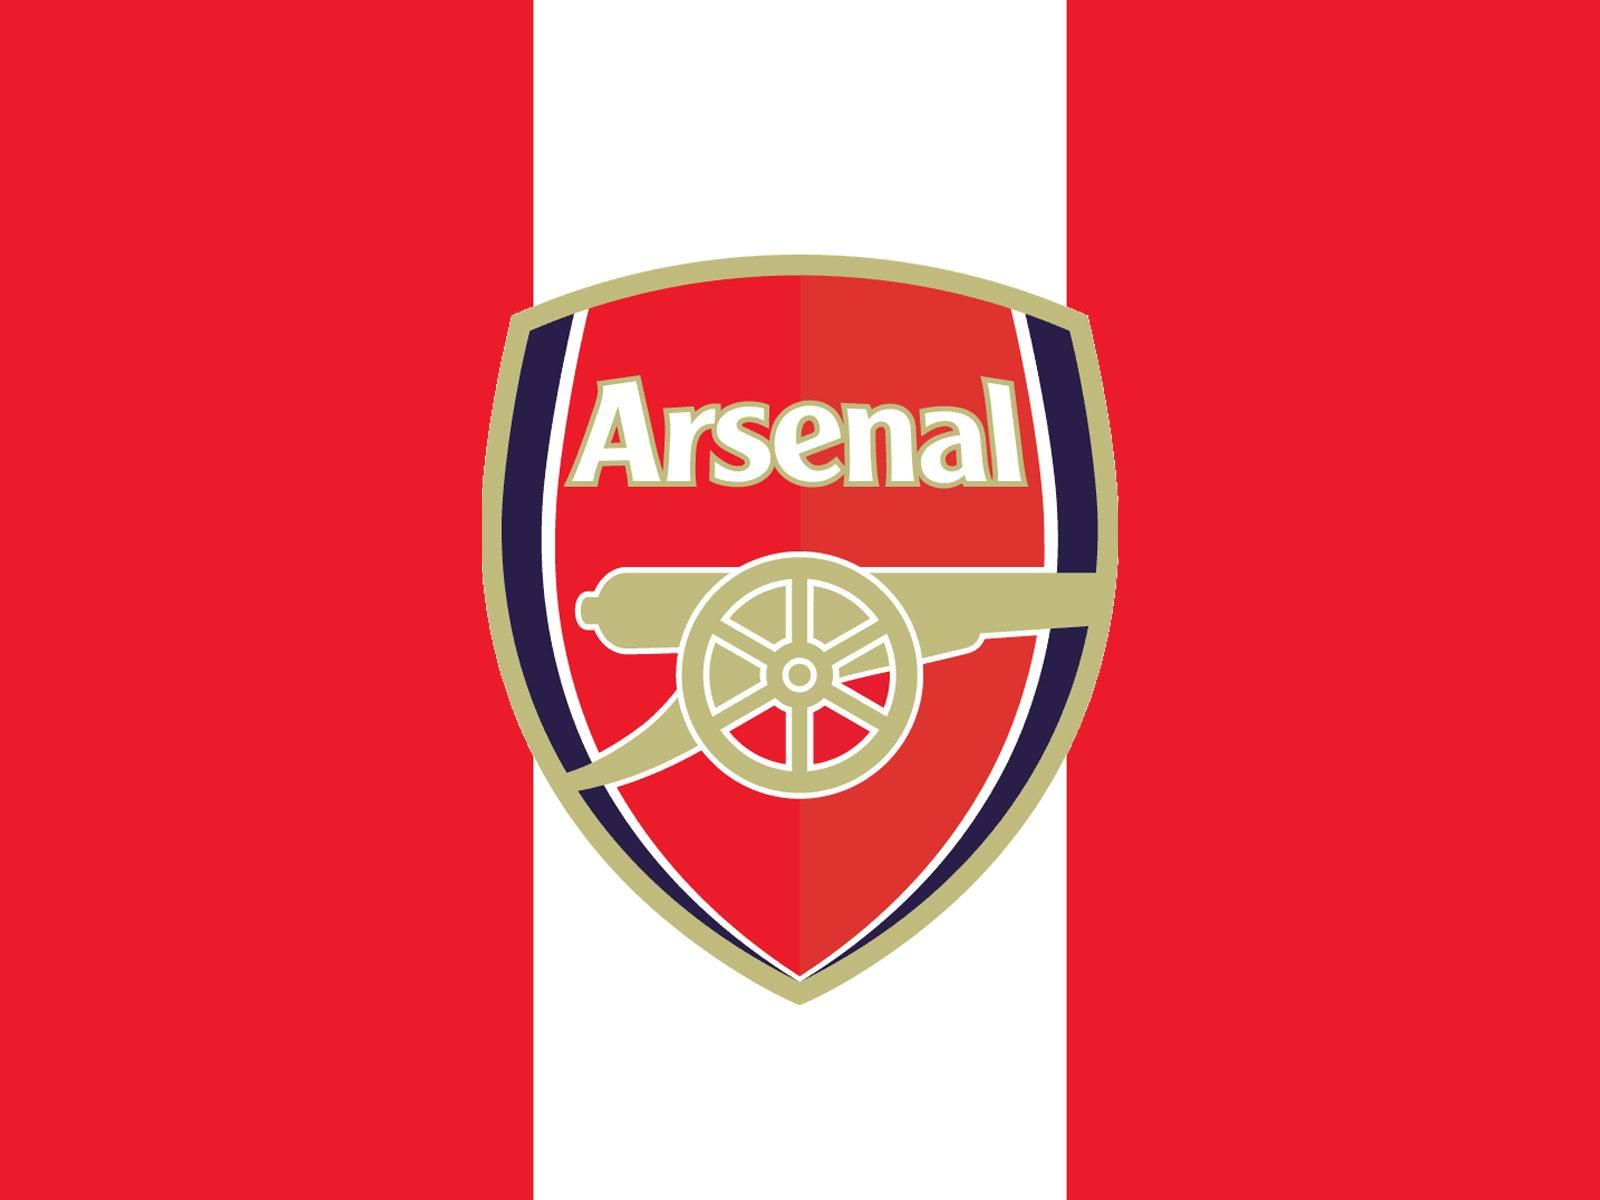 Logo Arsenal đỏ